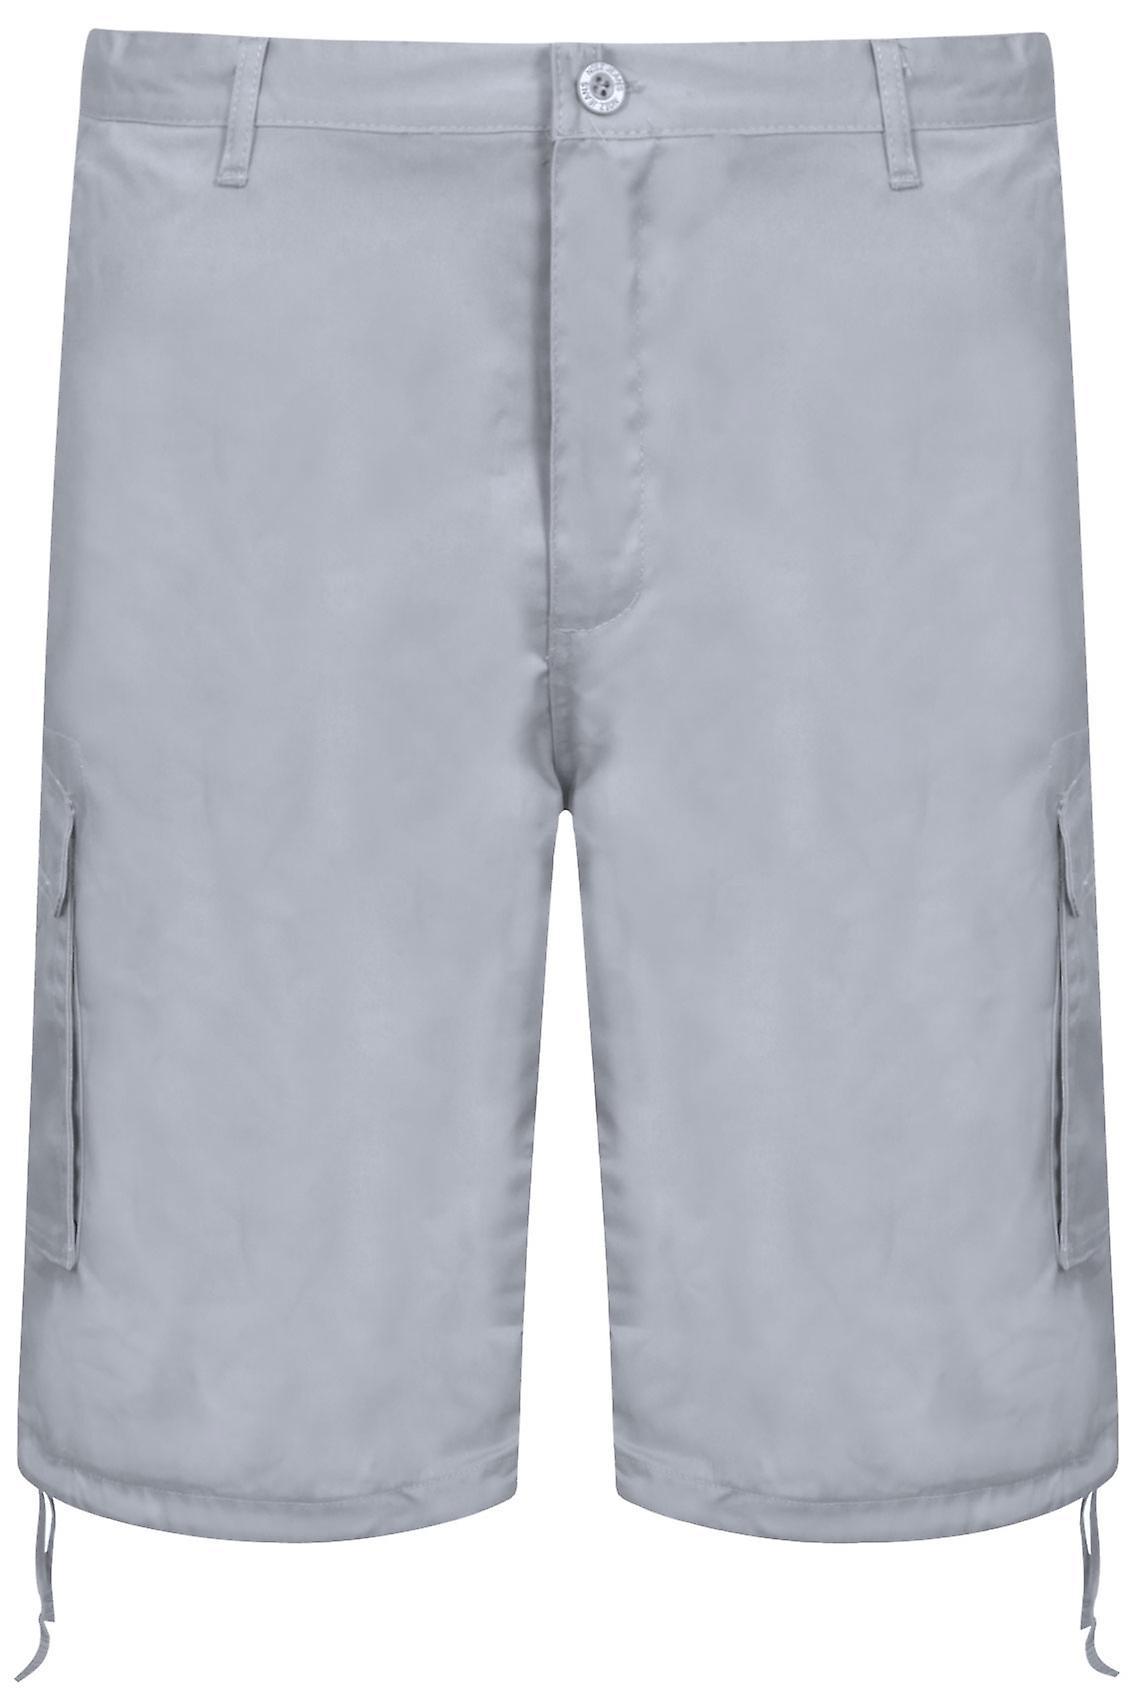 NOIZ Grey Cotton Cargo Shorts With Pockets